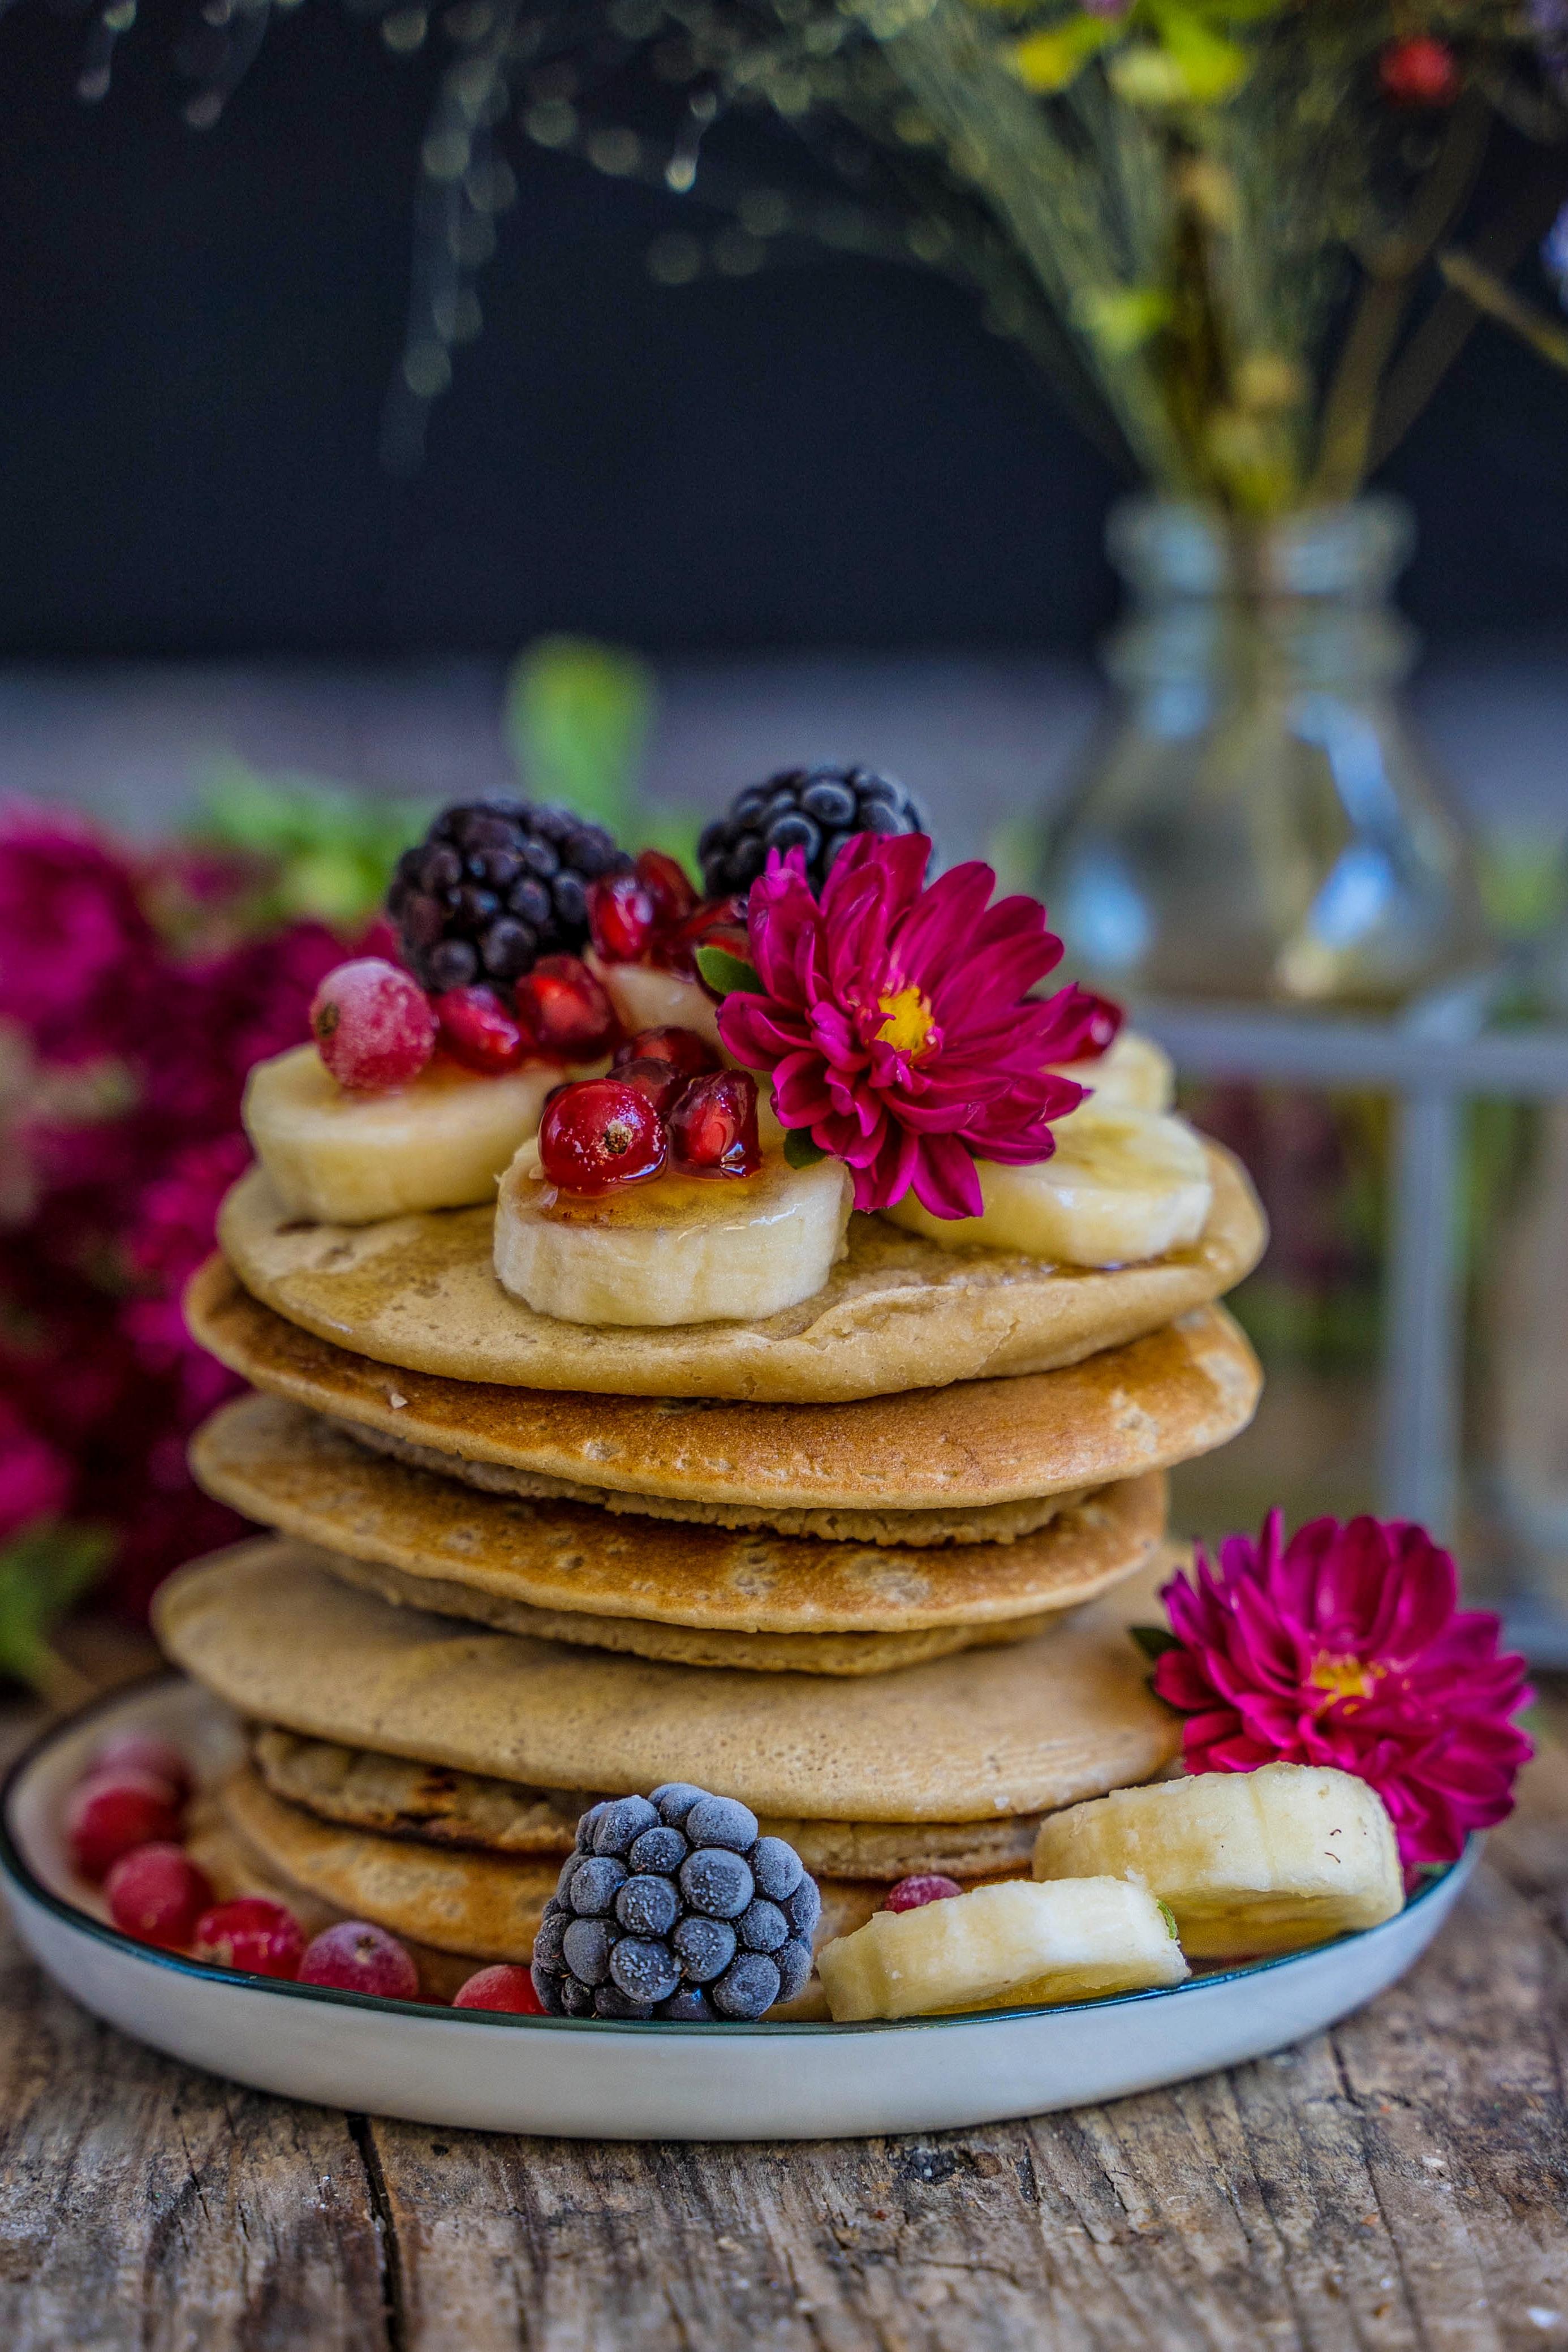 Gesunde Protein Pancakes - 4 Zutaten vegan Mrs Flury